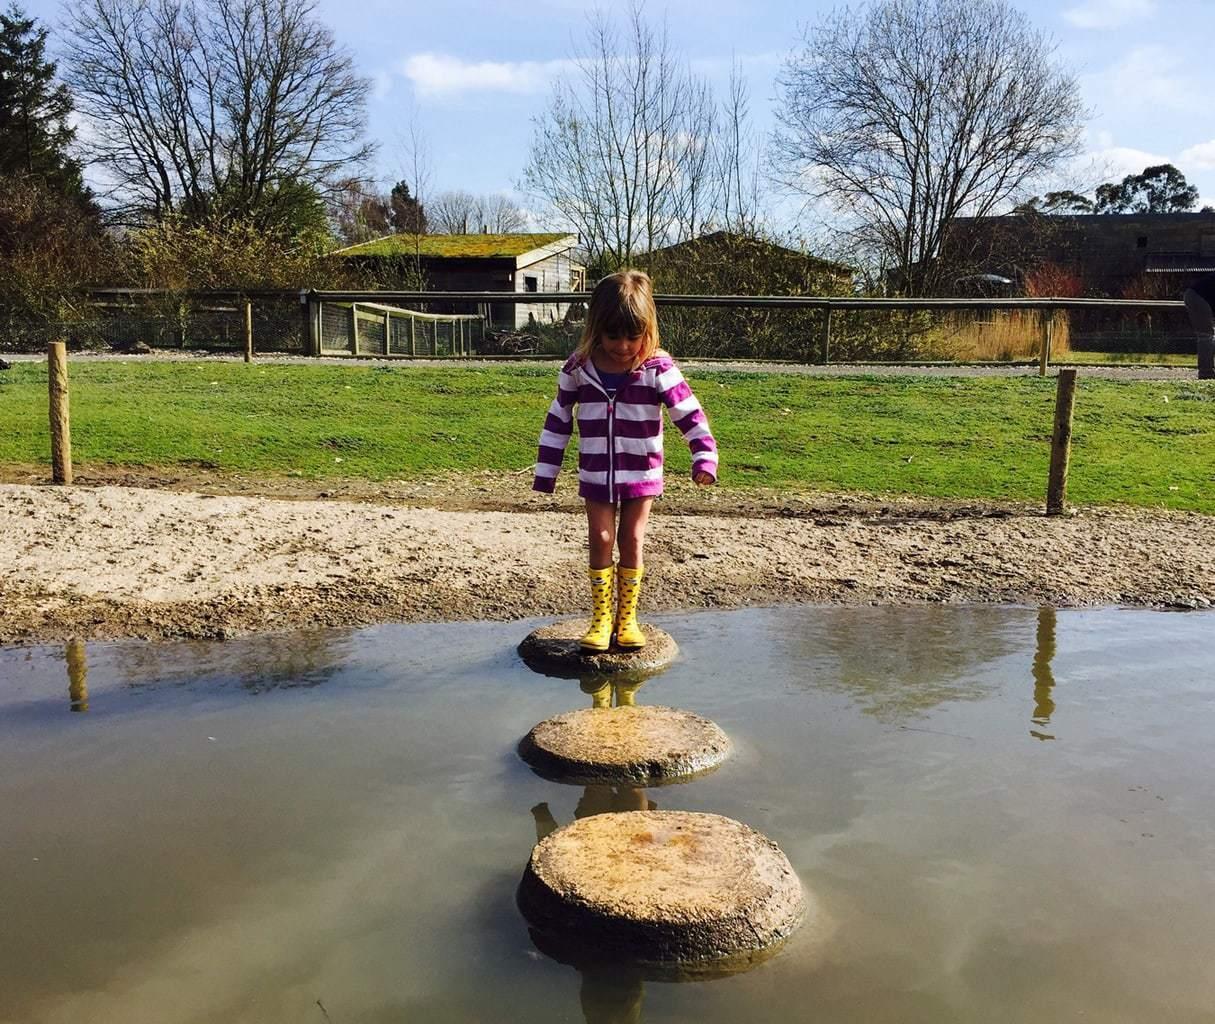 WWT Slimbridge – Slimbridge Wetland Centre